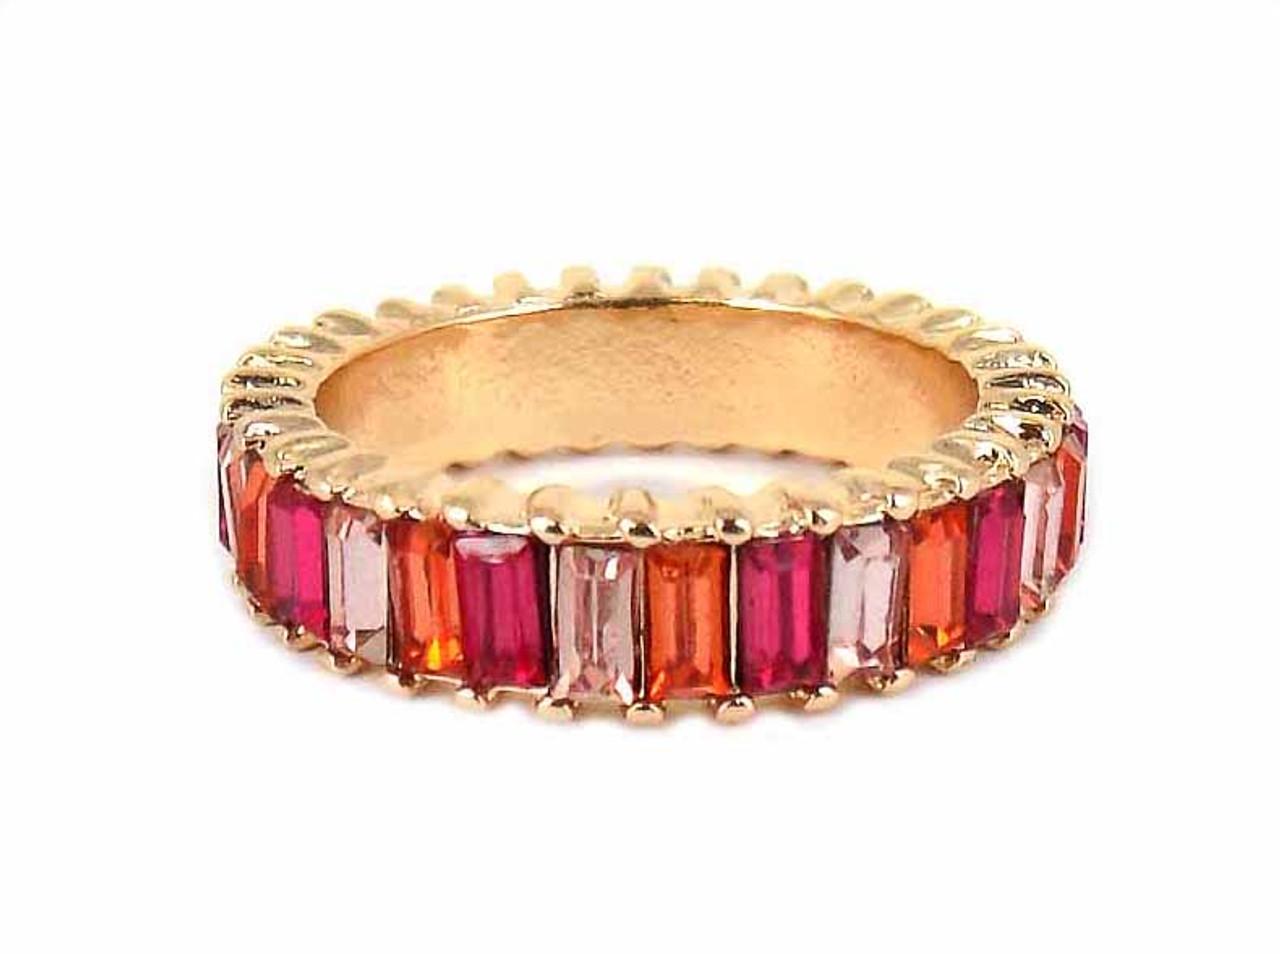 Viola Womens Fuchsia Monochrome Crystal Ring